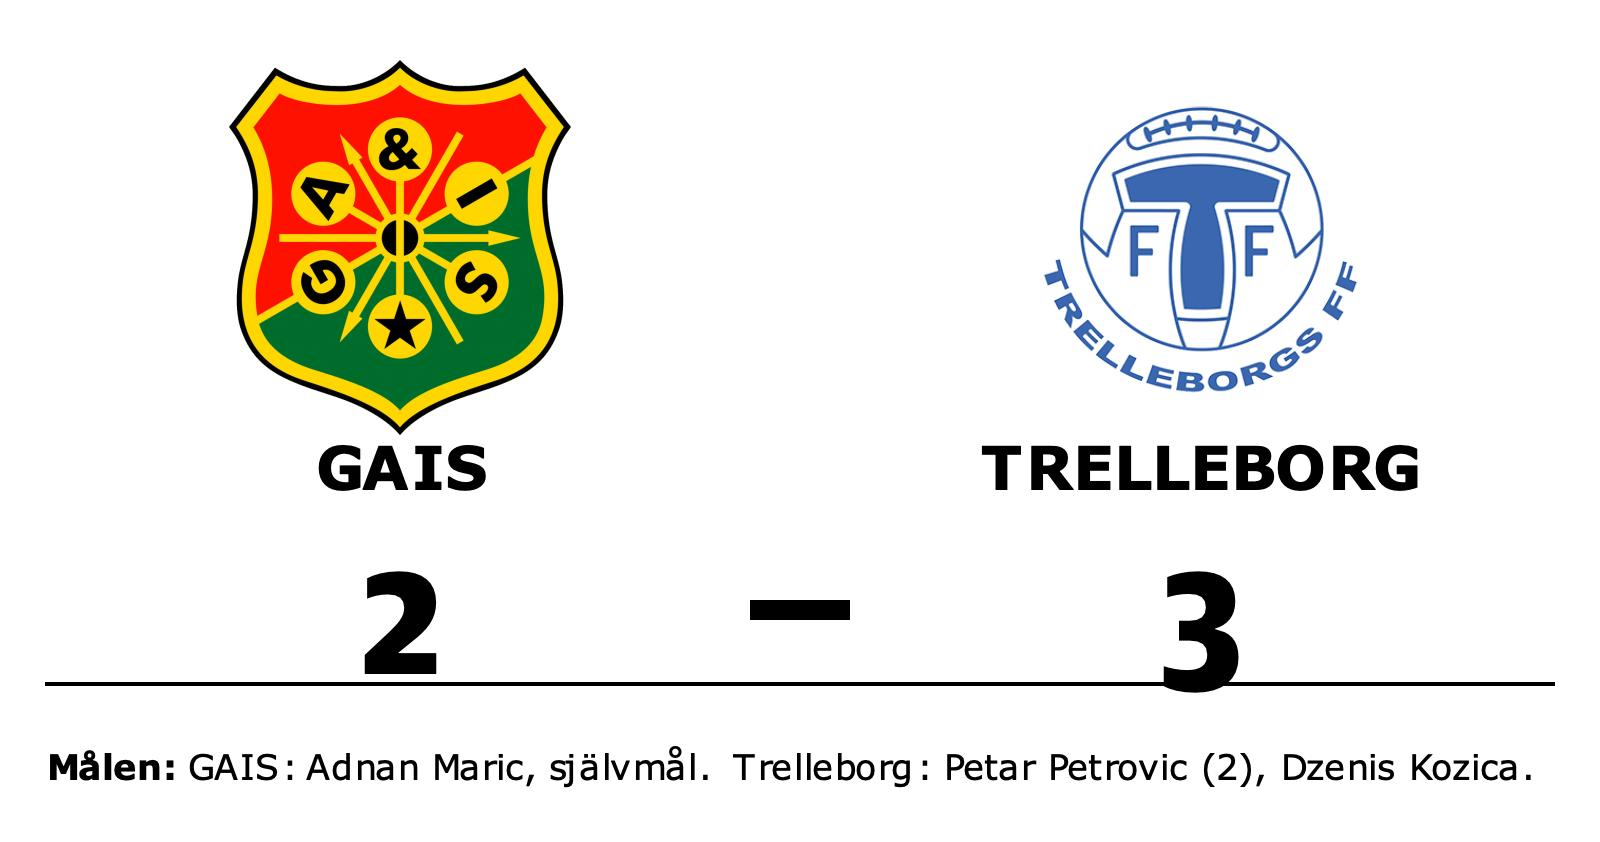 Trelleborg slog GAIS efter Petar Petrovics dubbel